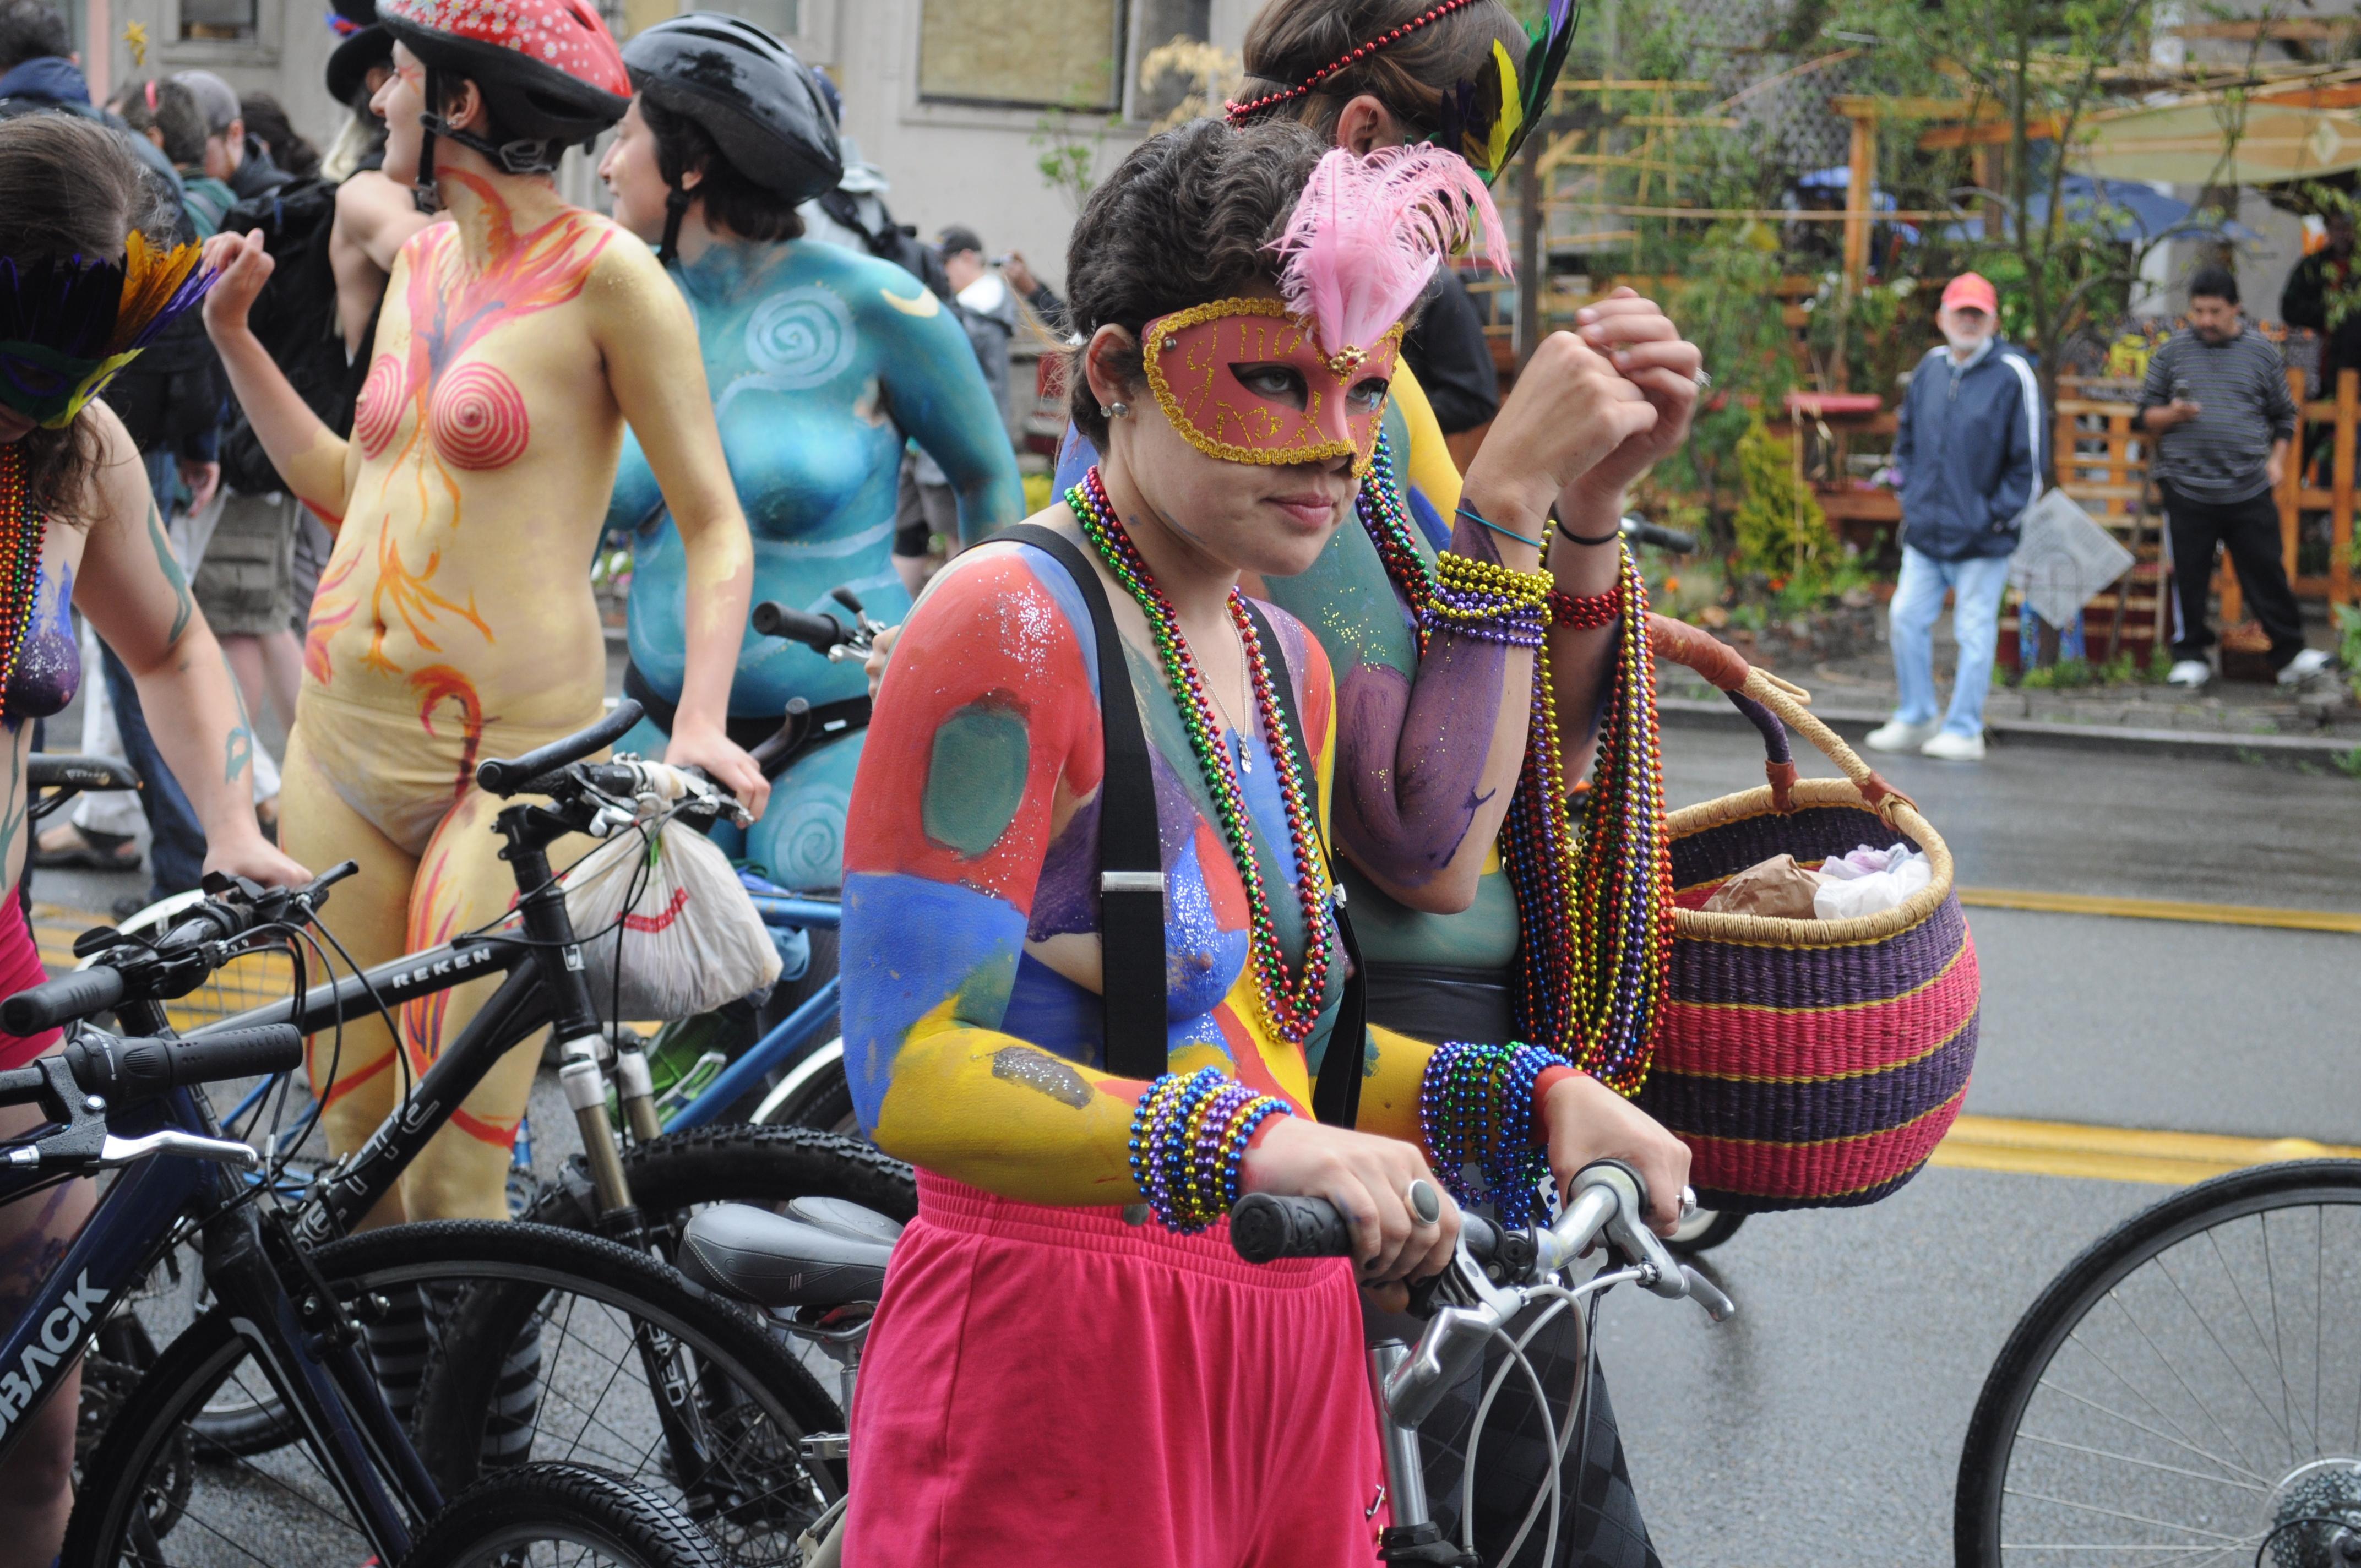 File:Fremont Solstice Parade 2011 - cyclists prepare 09 ...